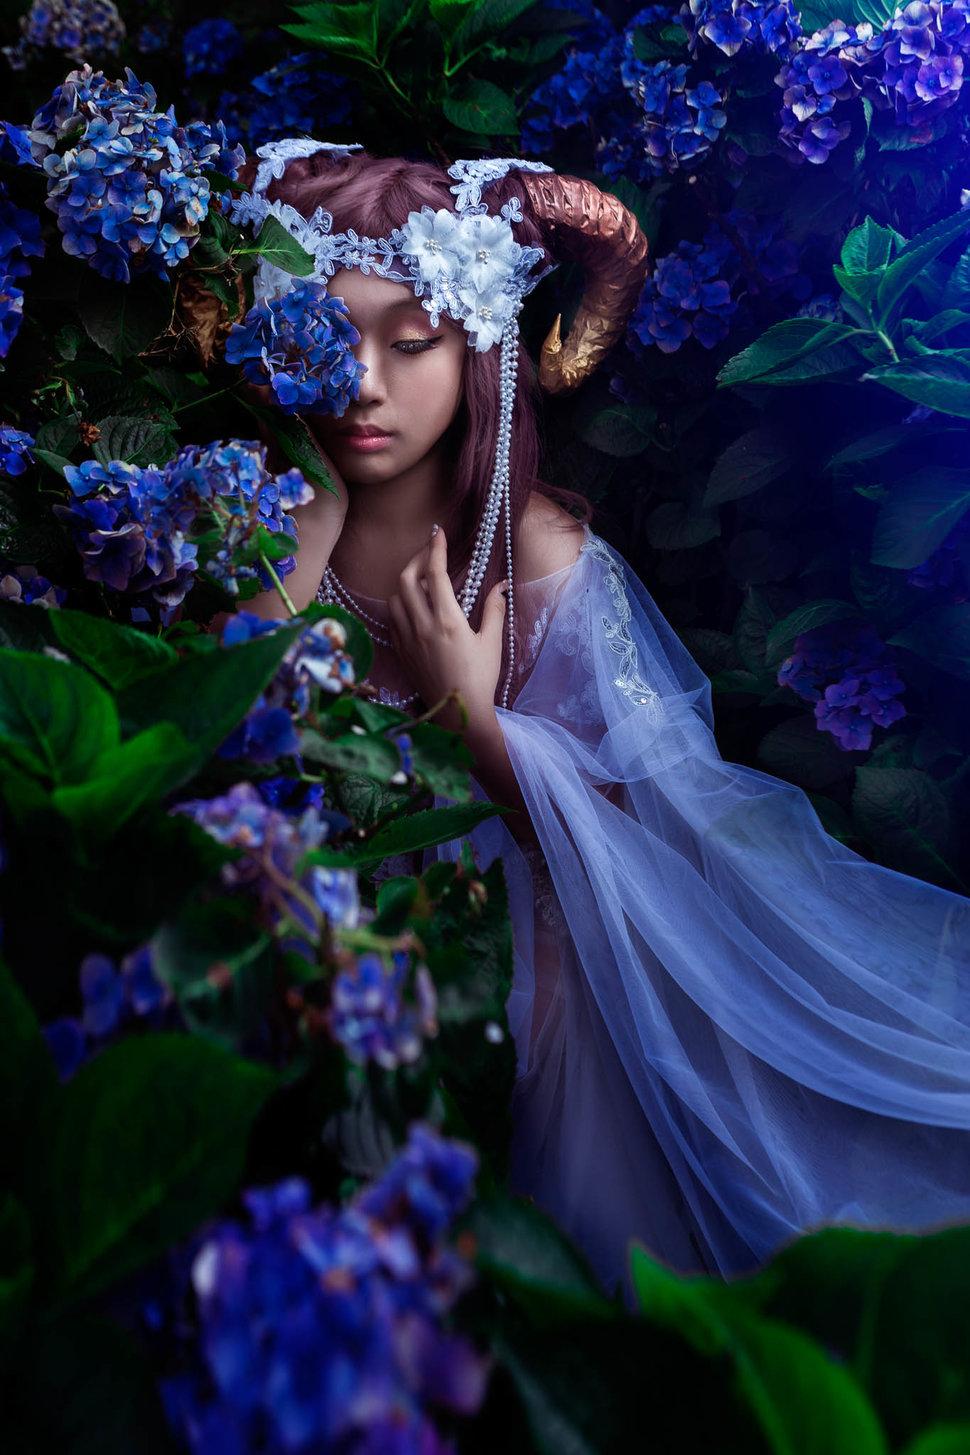 18PHOTO自主婚紗-紫陽花女孩(編號:214905) - 18PHOTO 婚紗影像攝影工作室 - 結婚吧